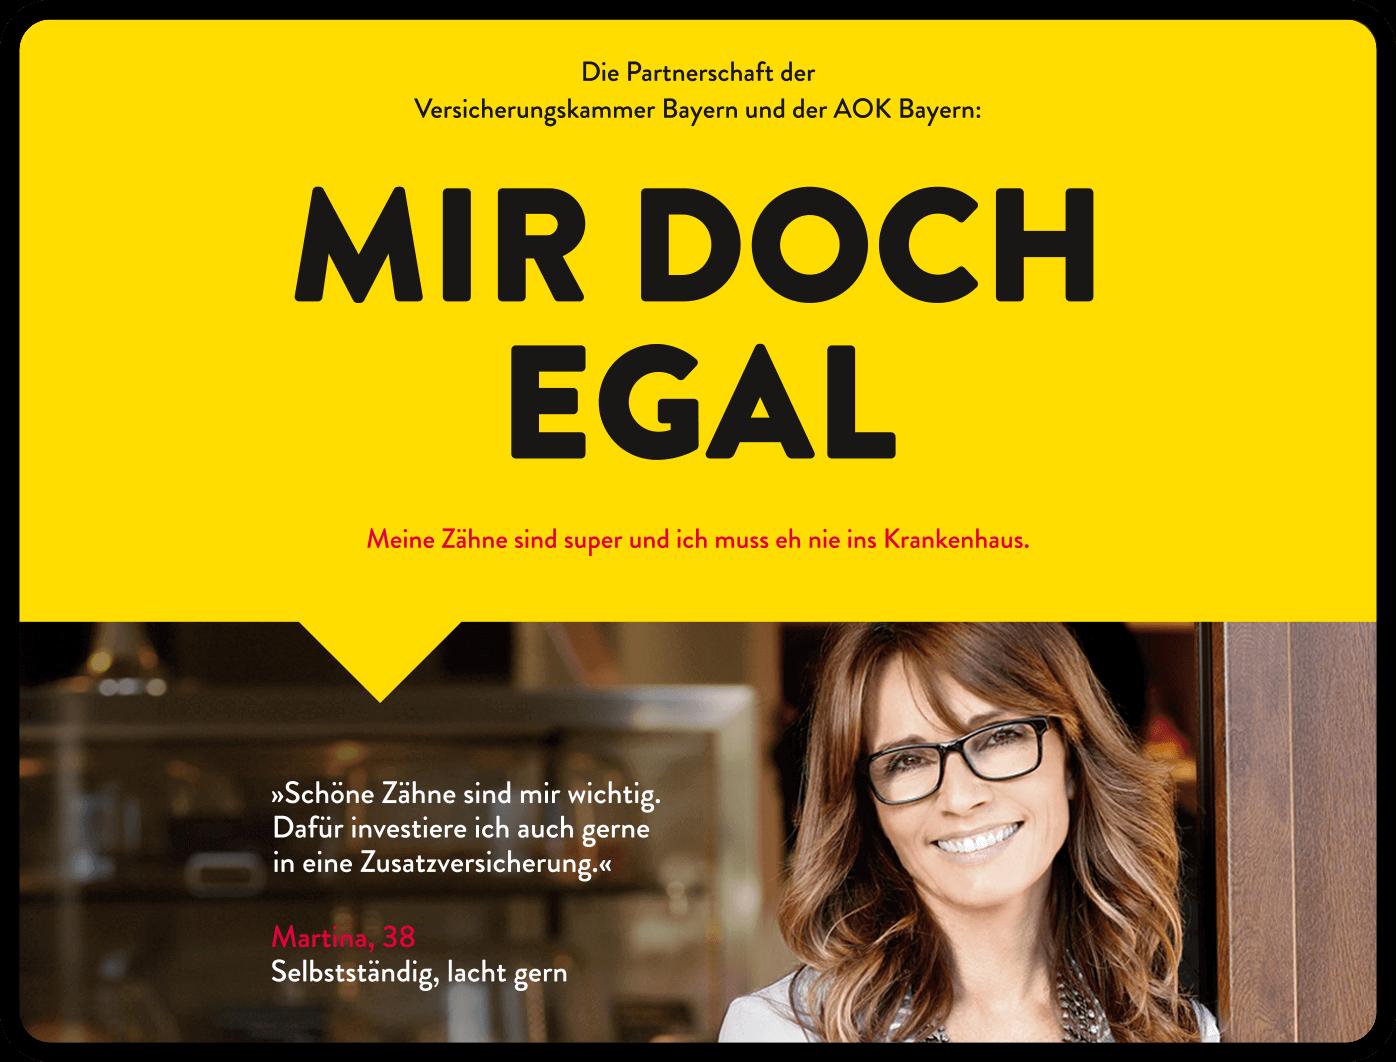 cyclos vkb aok kampagne website statisch Marketing Krankenkasse werbeagentur